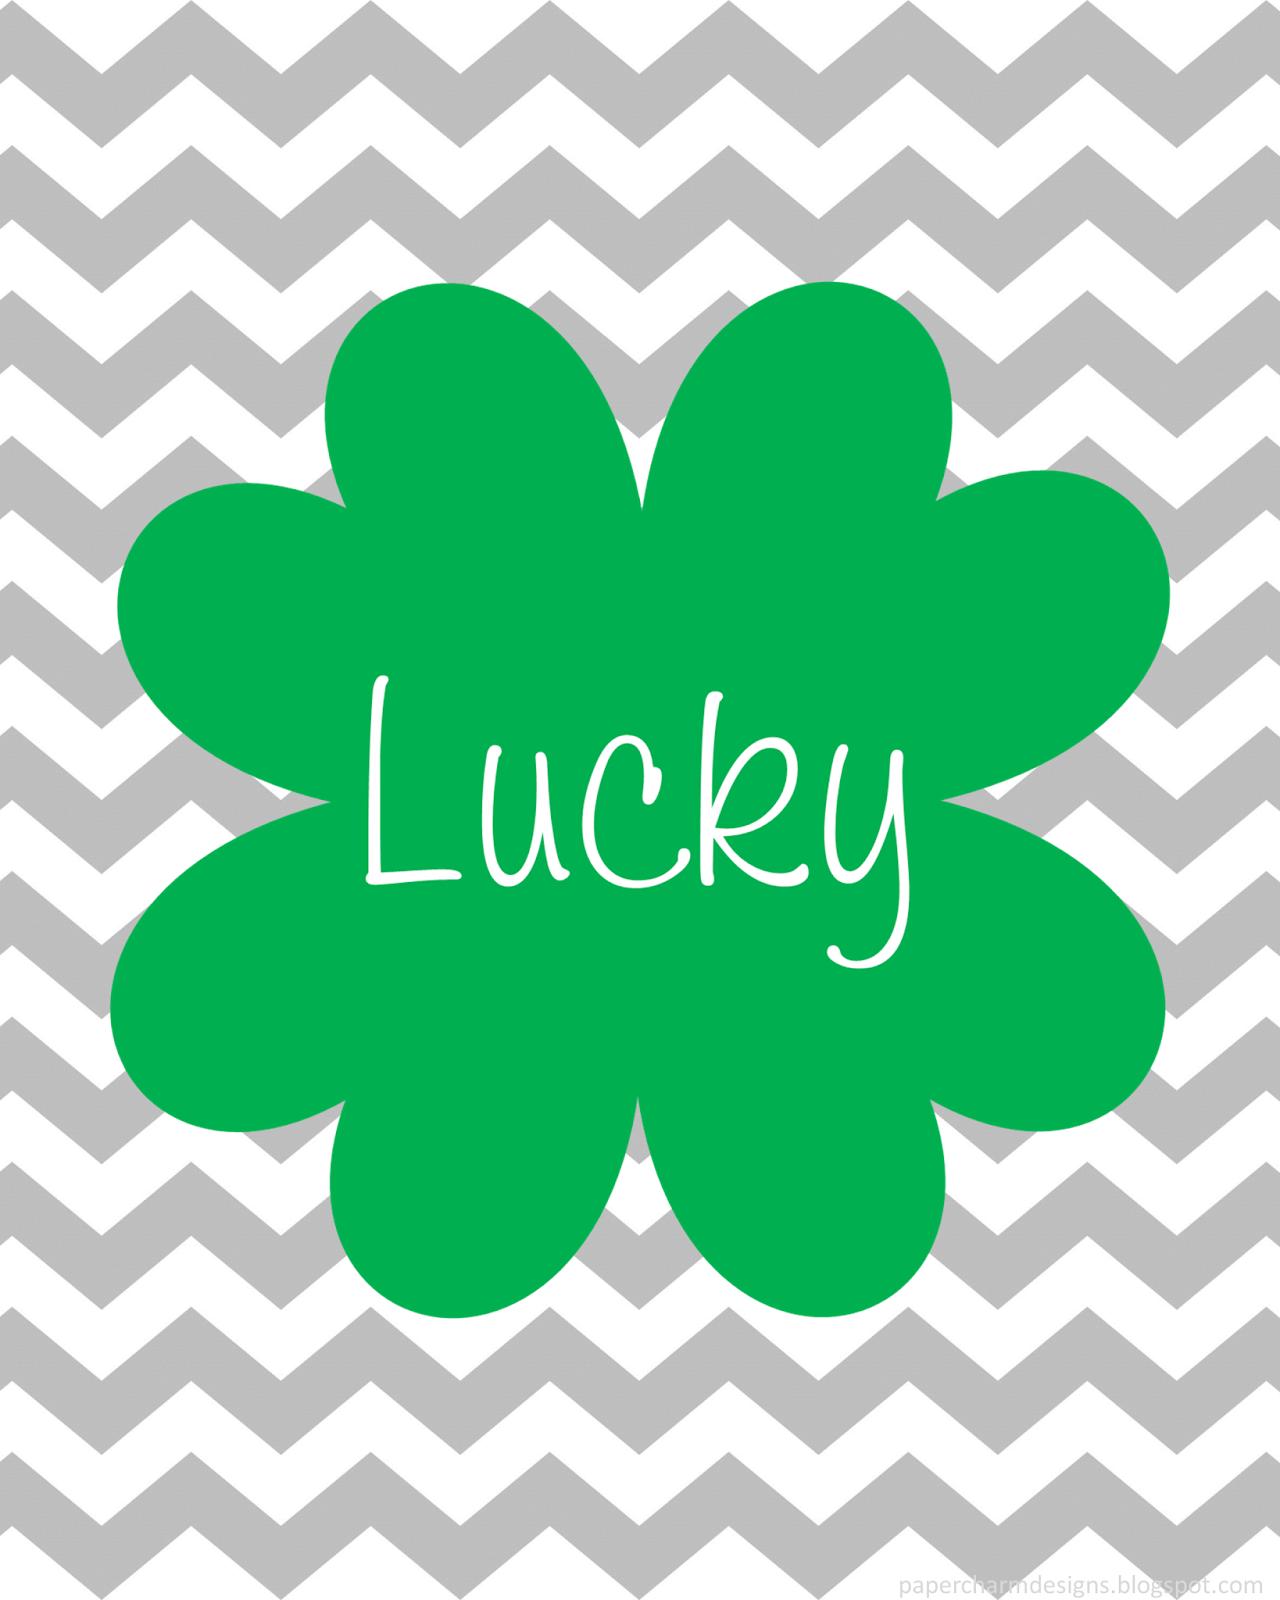 Lucky Shamrock Printable St. Patrick's Day Art @ PaperCharm Designs